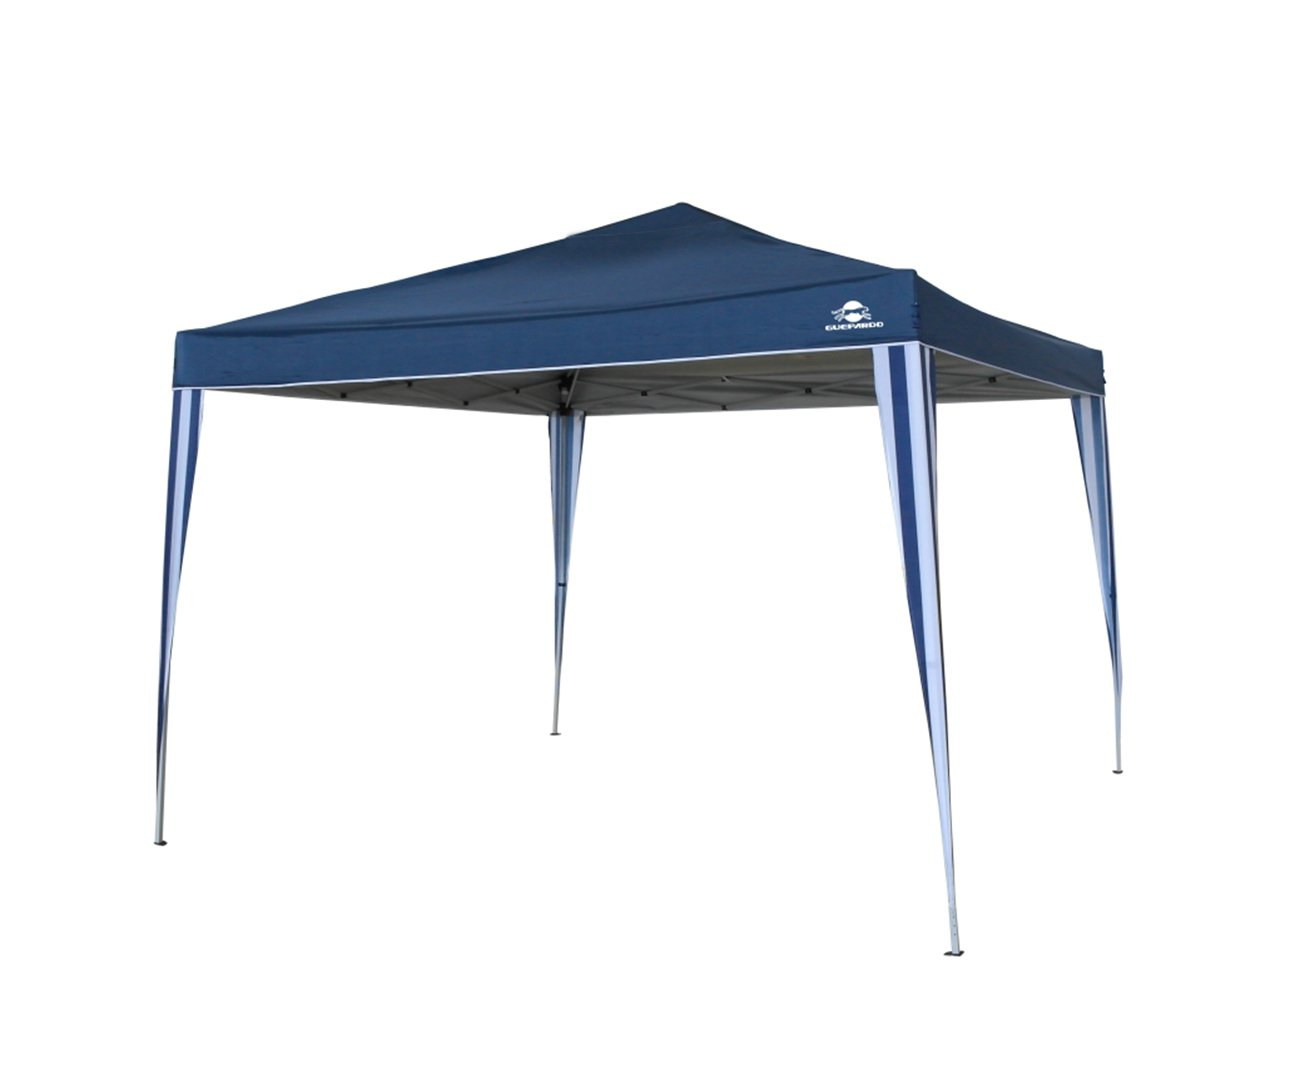 Tenda Gazebo Articulado Azul New Pratiko 3x3 Fps 60+ Guepardo